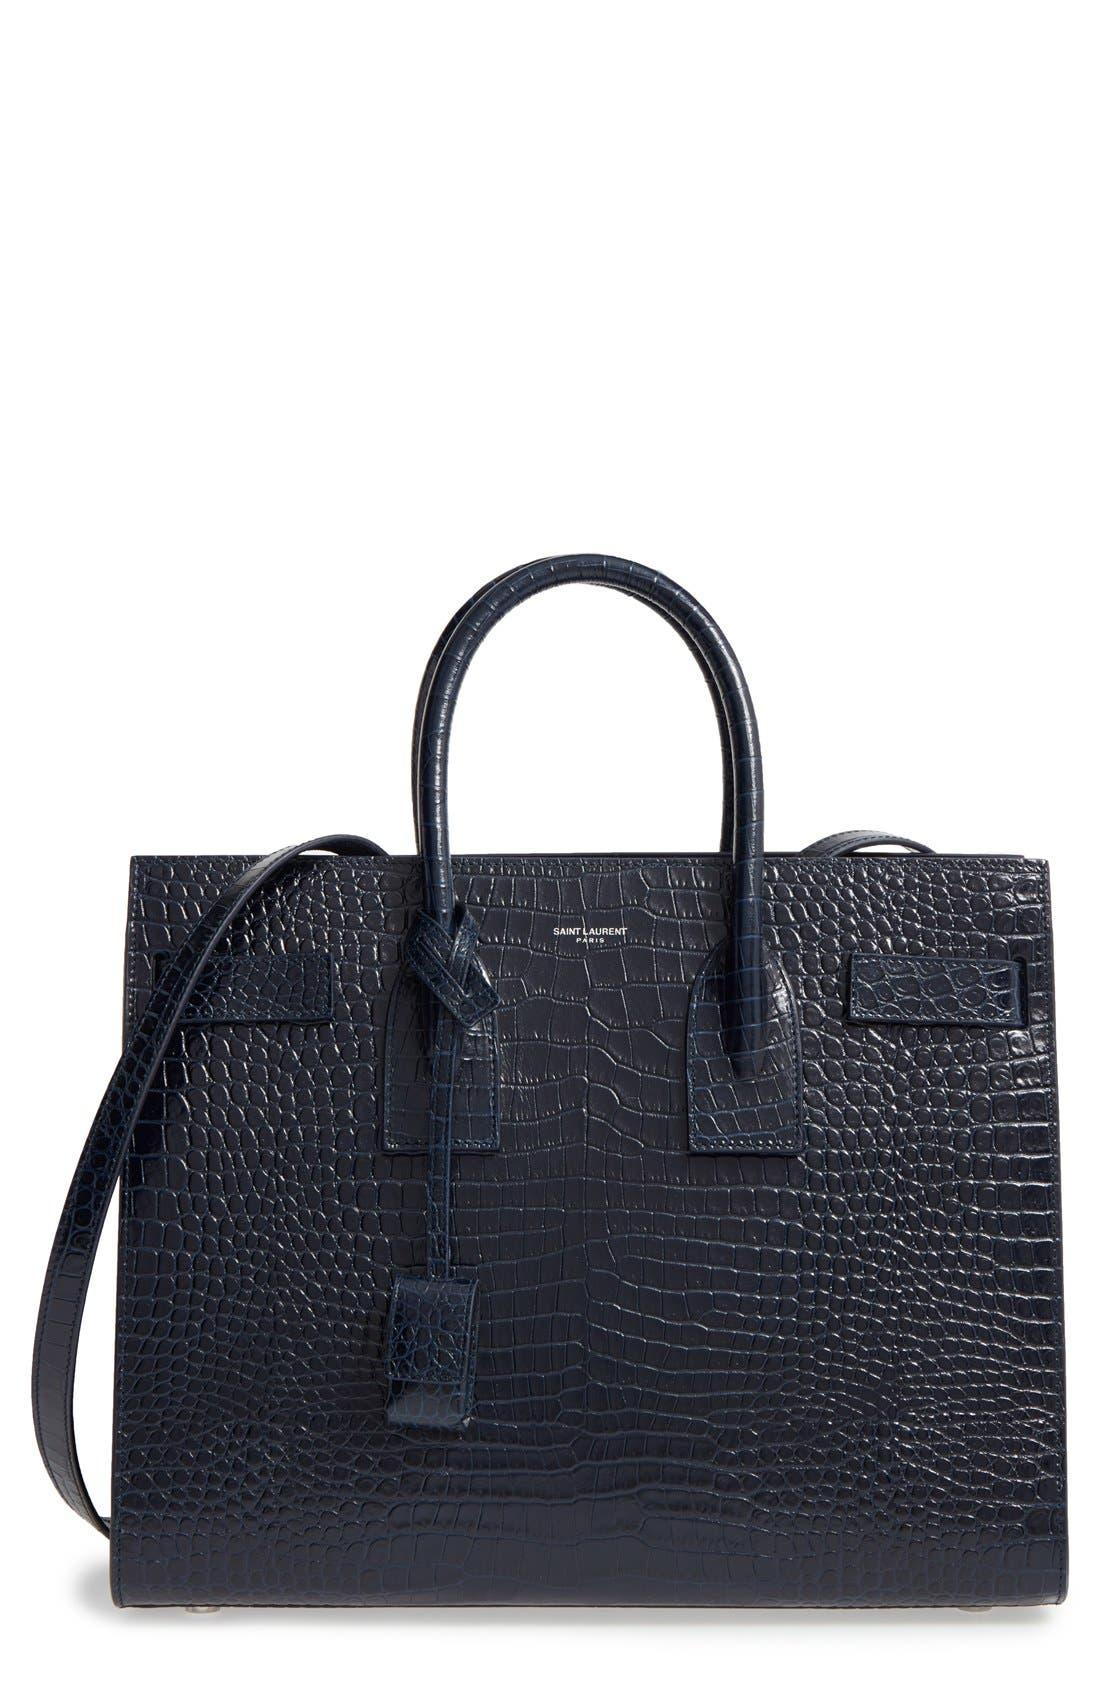 Saint Laurent Small Sac de Jour Croc Embossed Calfskin Leather Tote